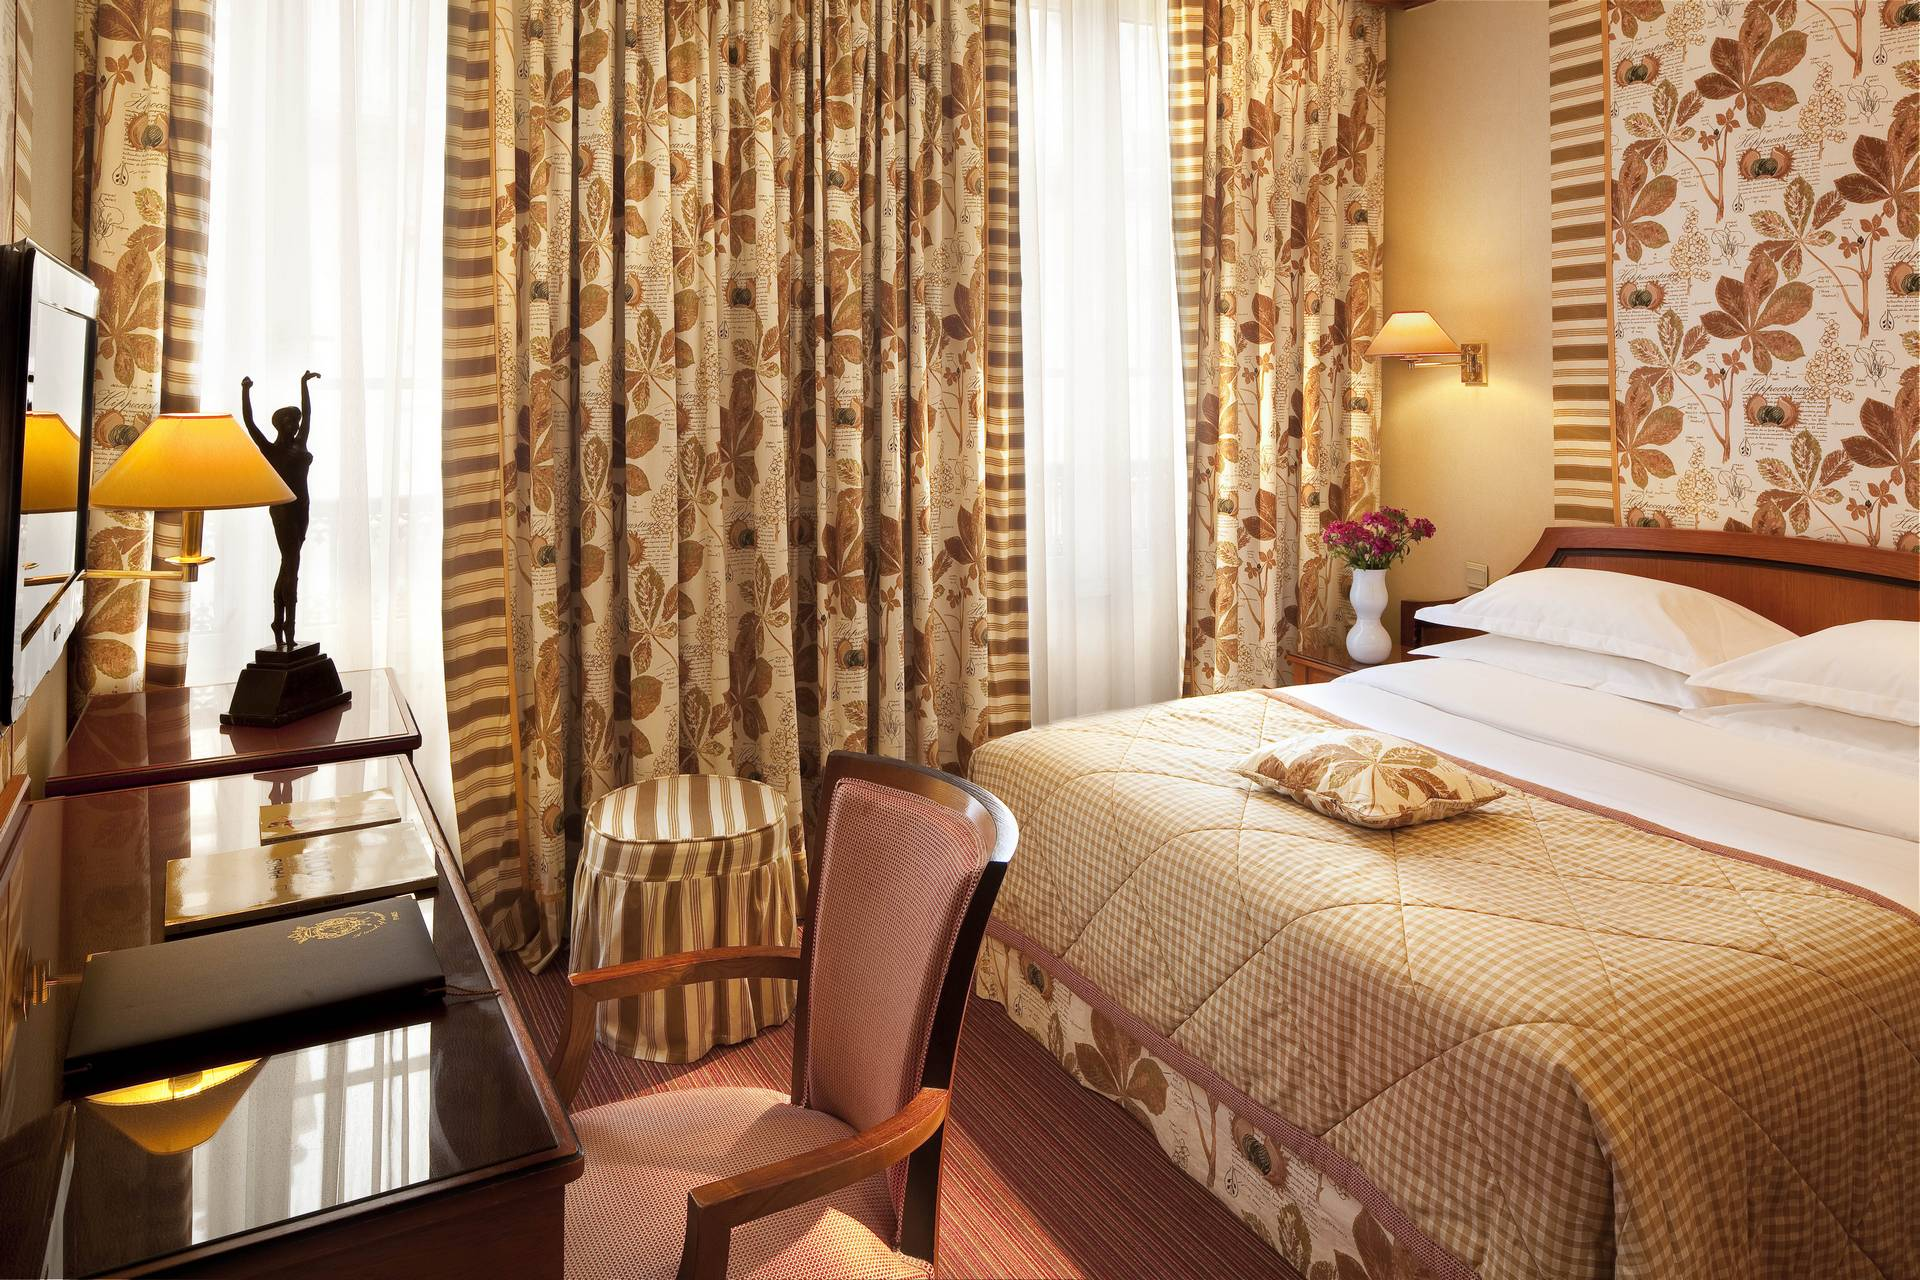 Connecting Rooms Davanzati Hotel: Hôtel Horset Opéra Paris